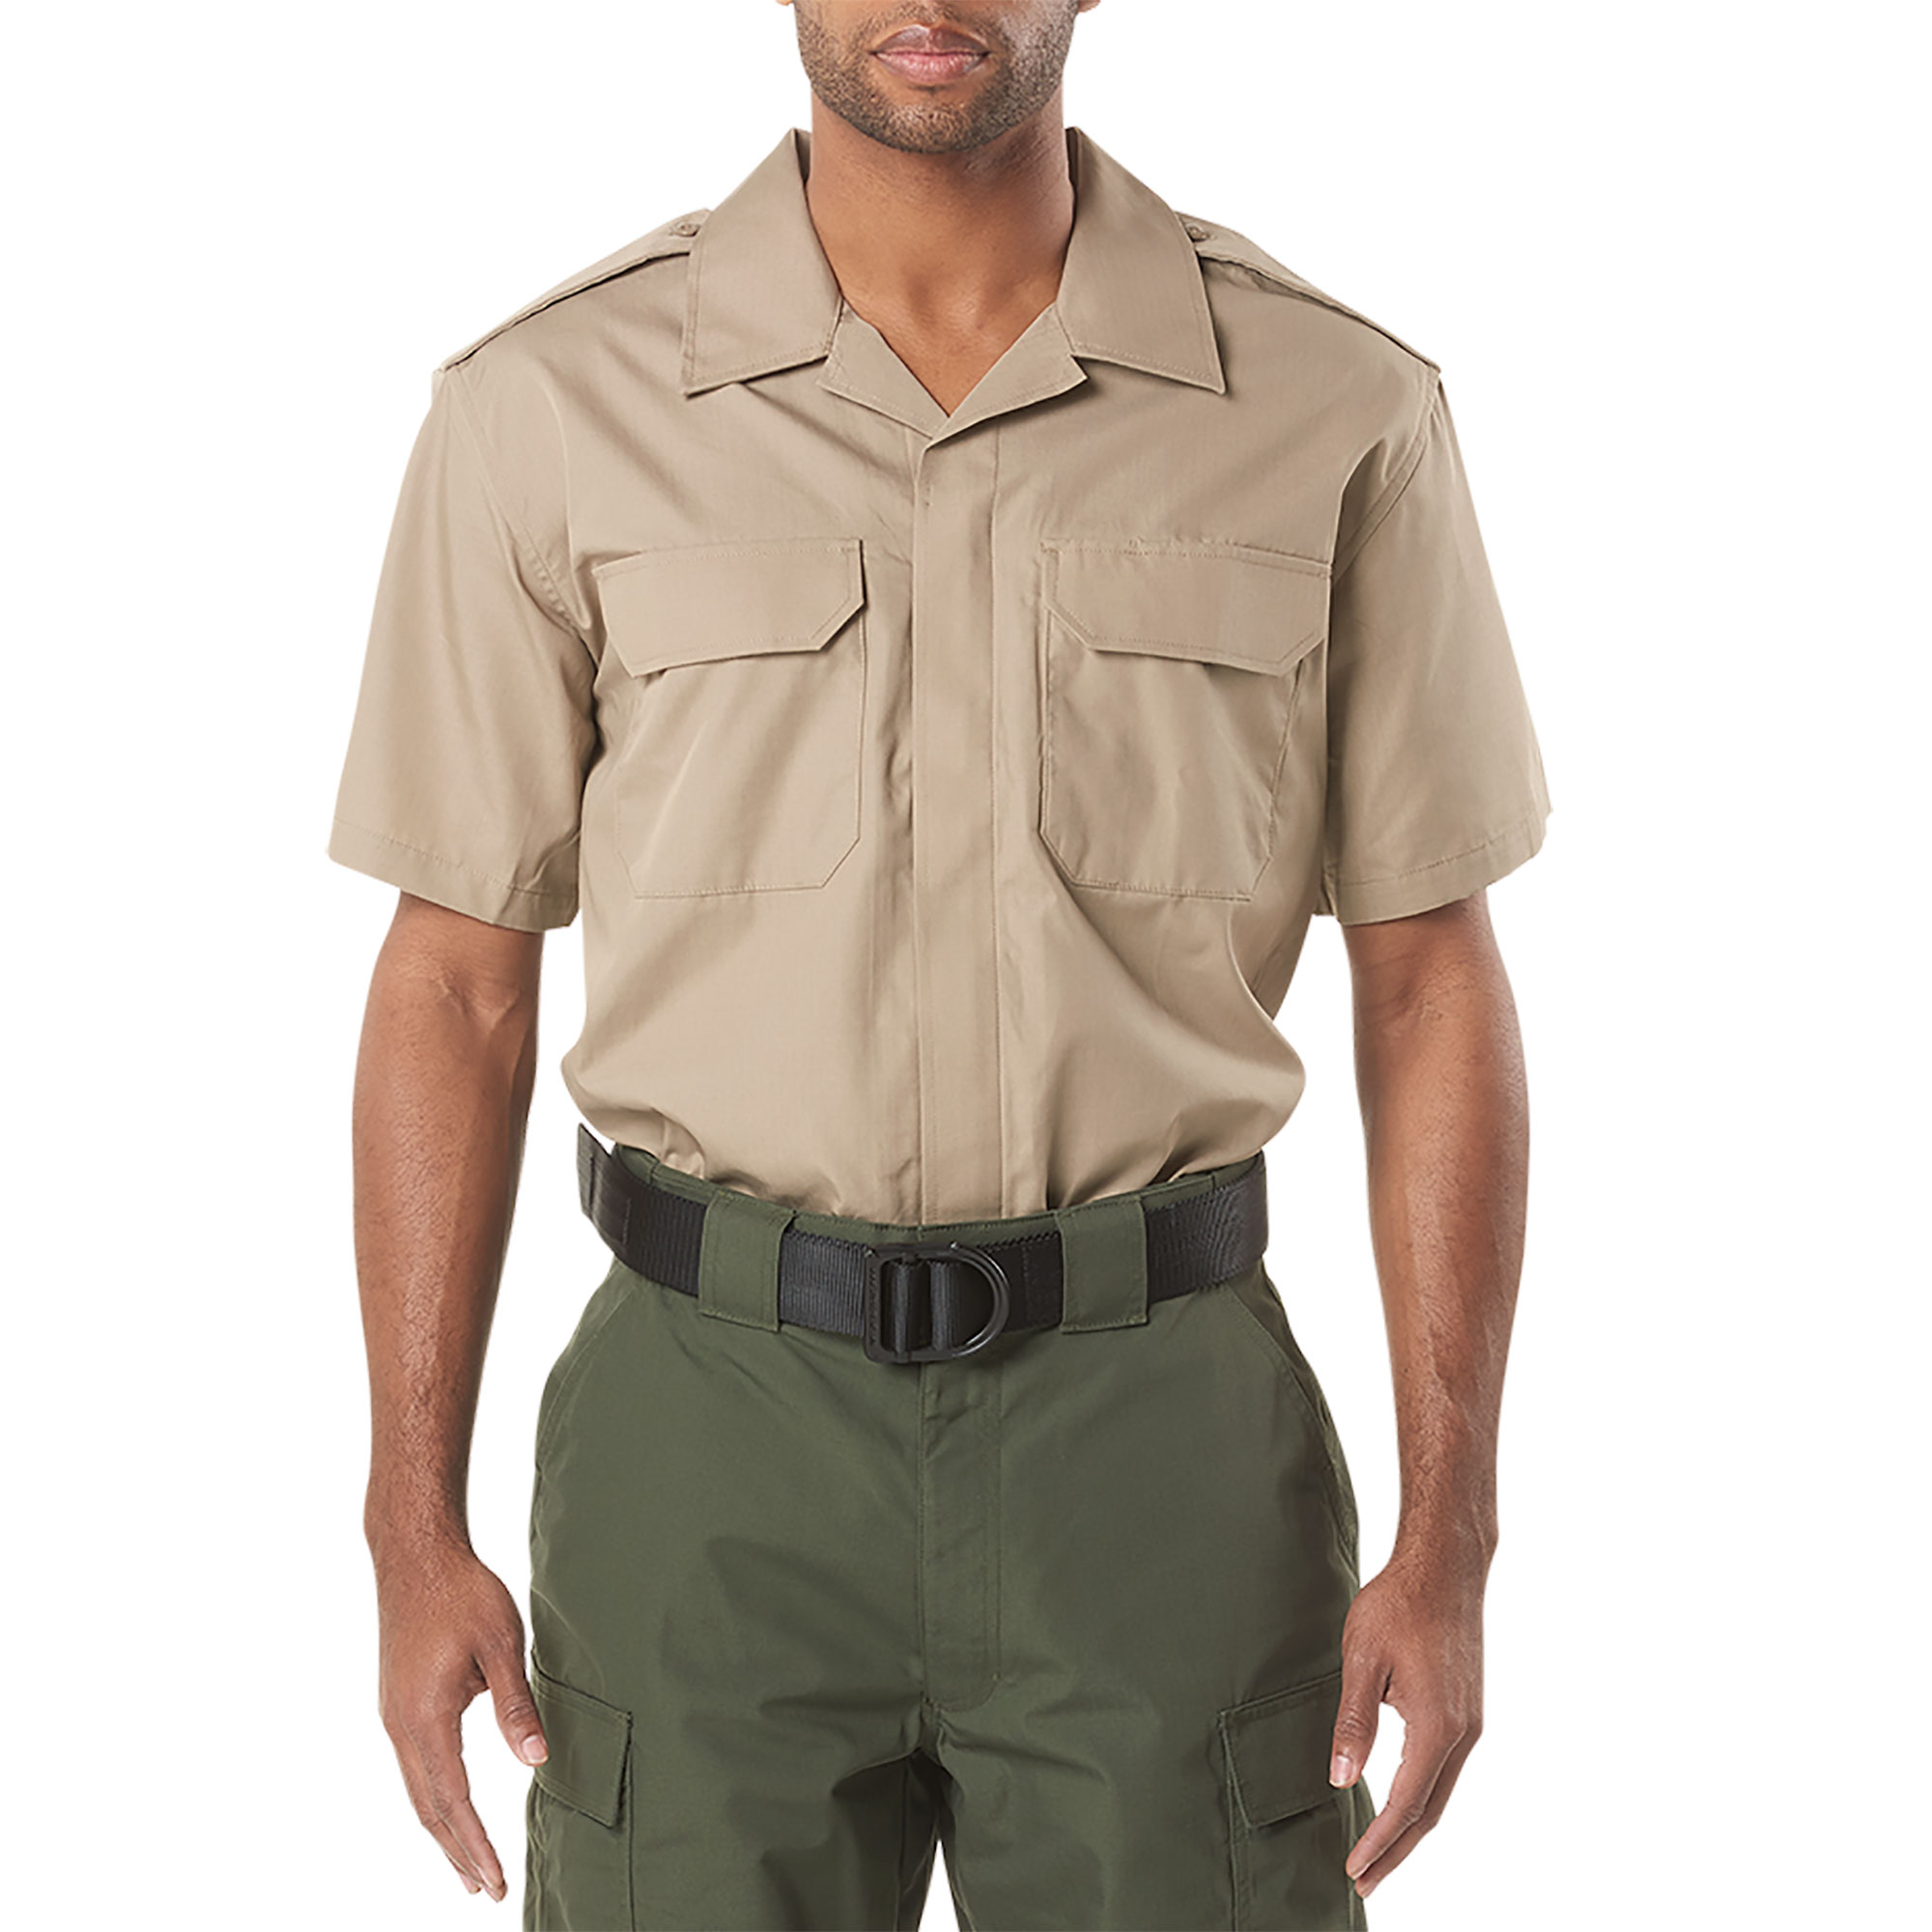 5.11 Tactical Men CDCR Line Duty Short Sleeve Shirt (Khaki/Tan)